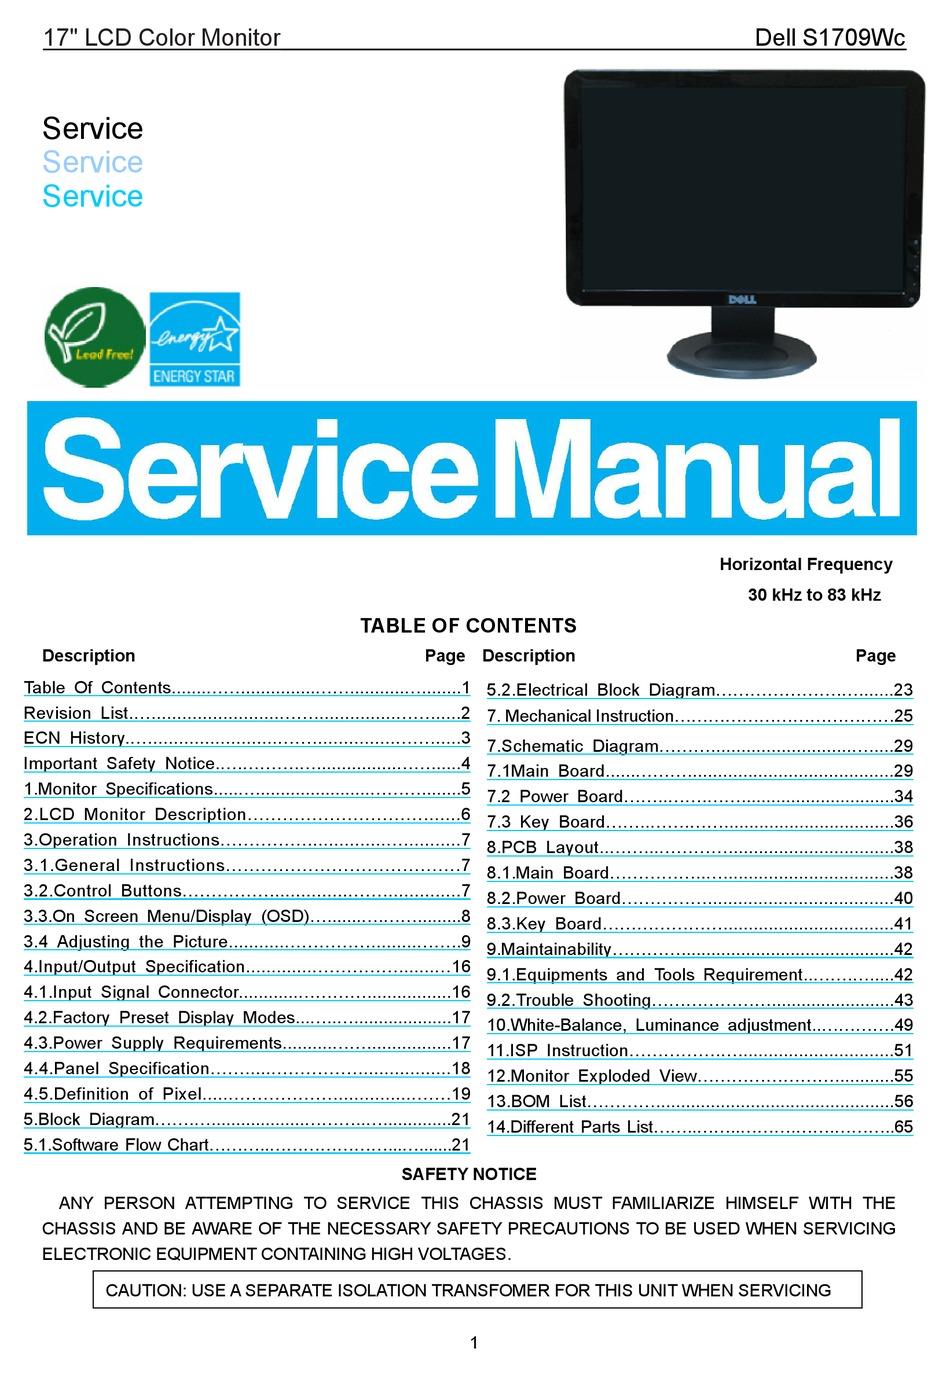 DELL S1709WC SERVICE MANUAL Pdf Download | ManualsLib